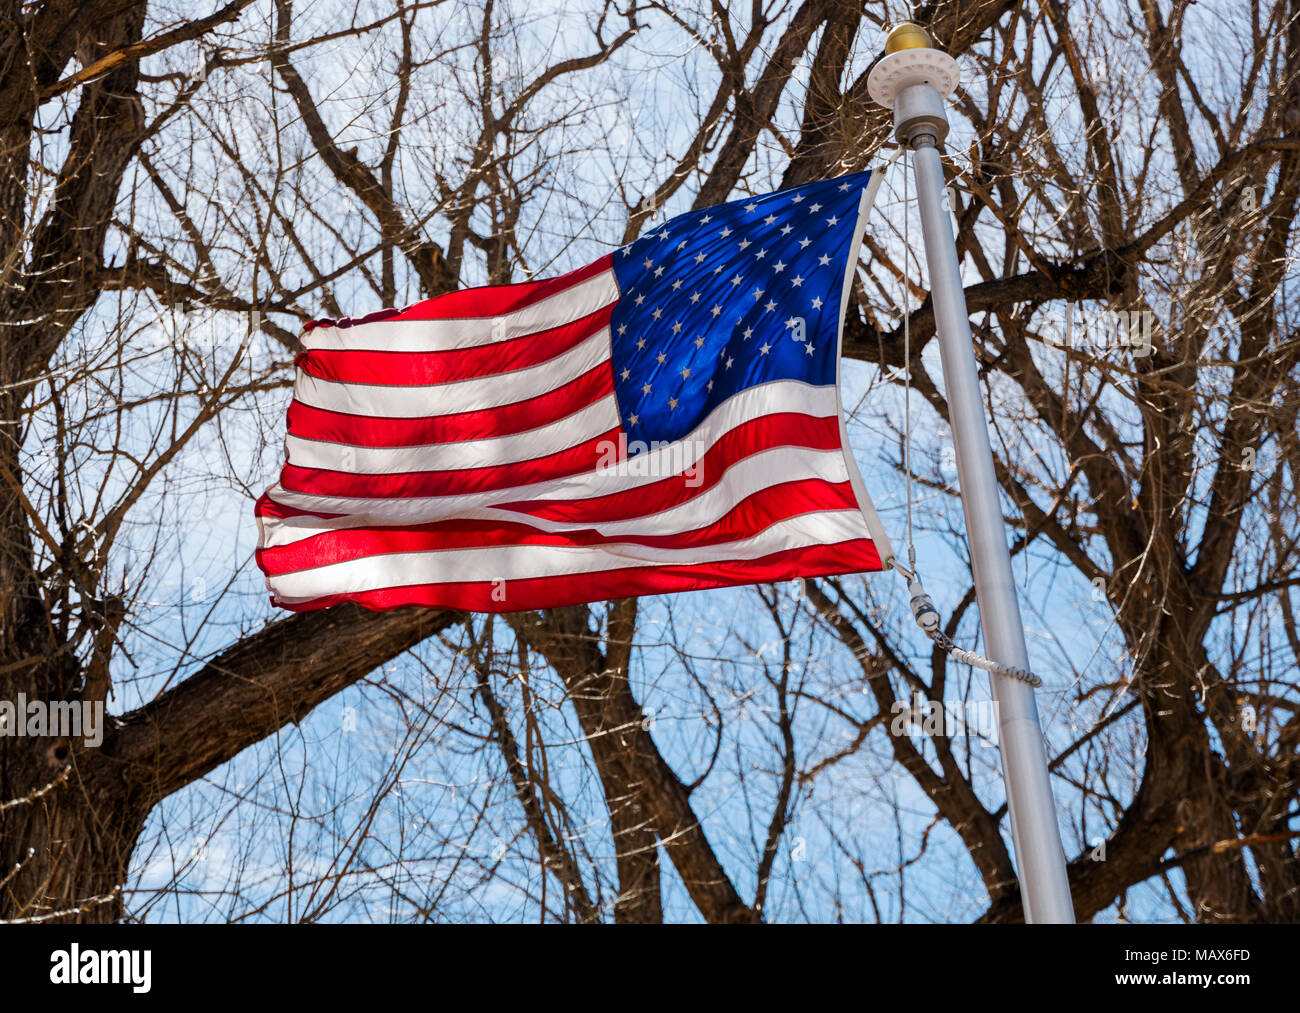 Patriotic symbols stock photos patriotic symbols stock images alamy american flag flying against blue sky tree branches in riverside park salida colorado buycottarizona Choice Image